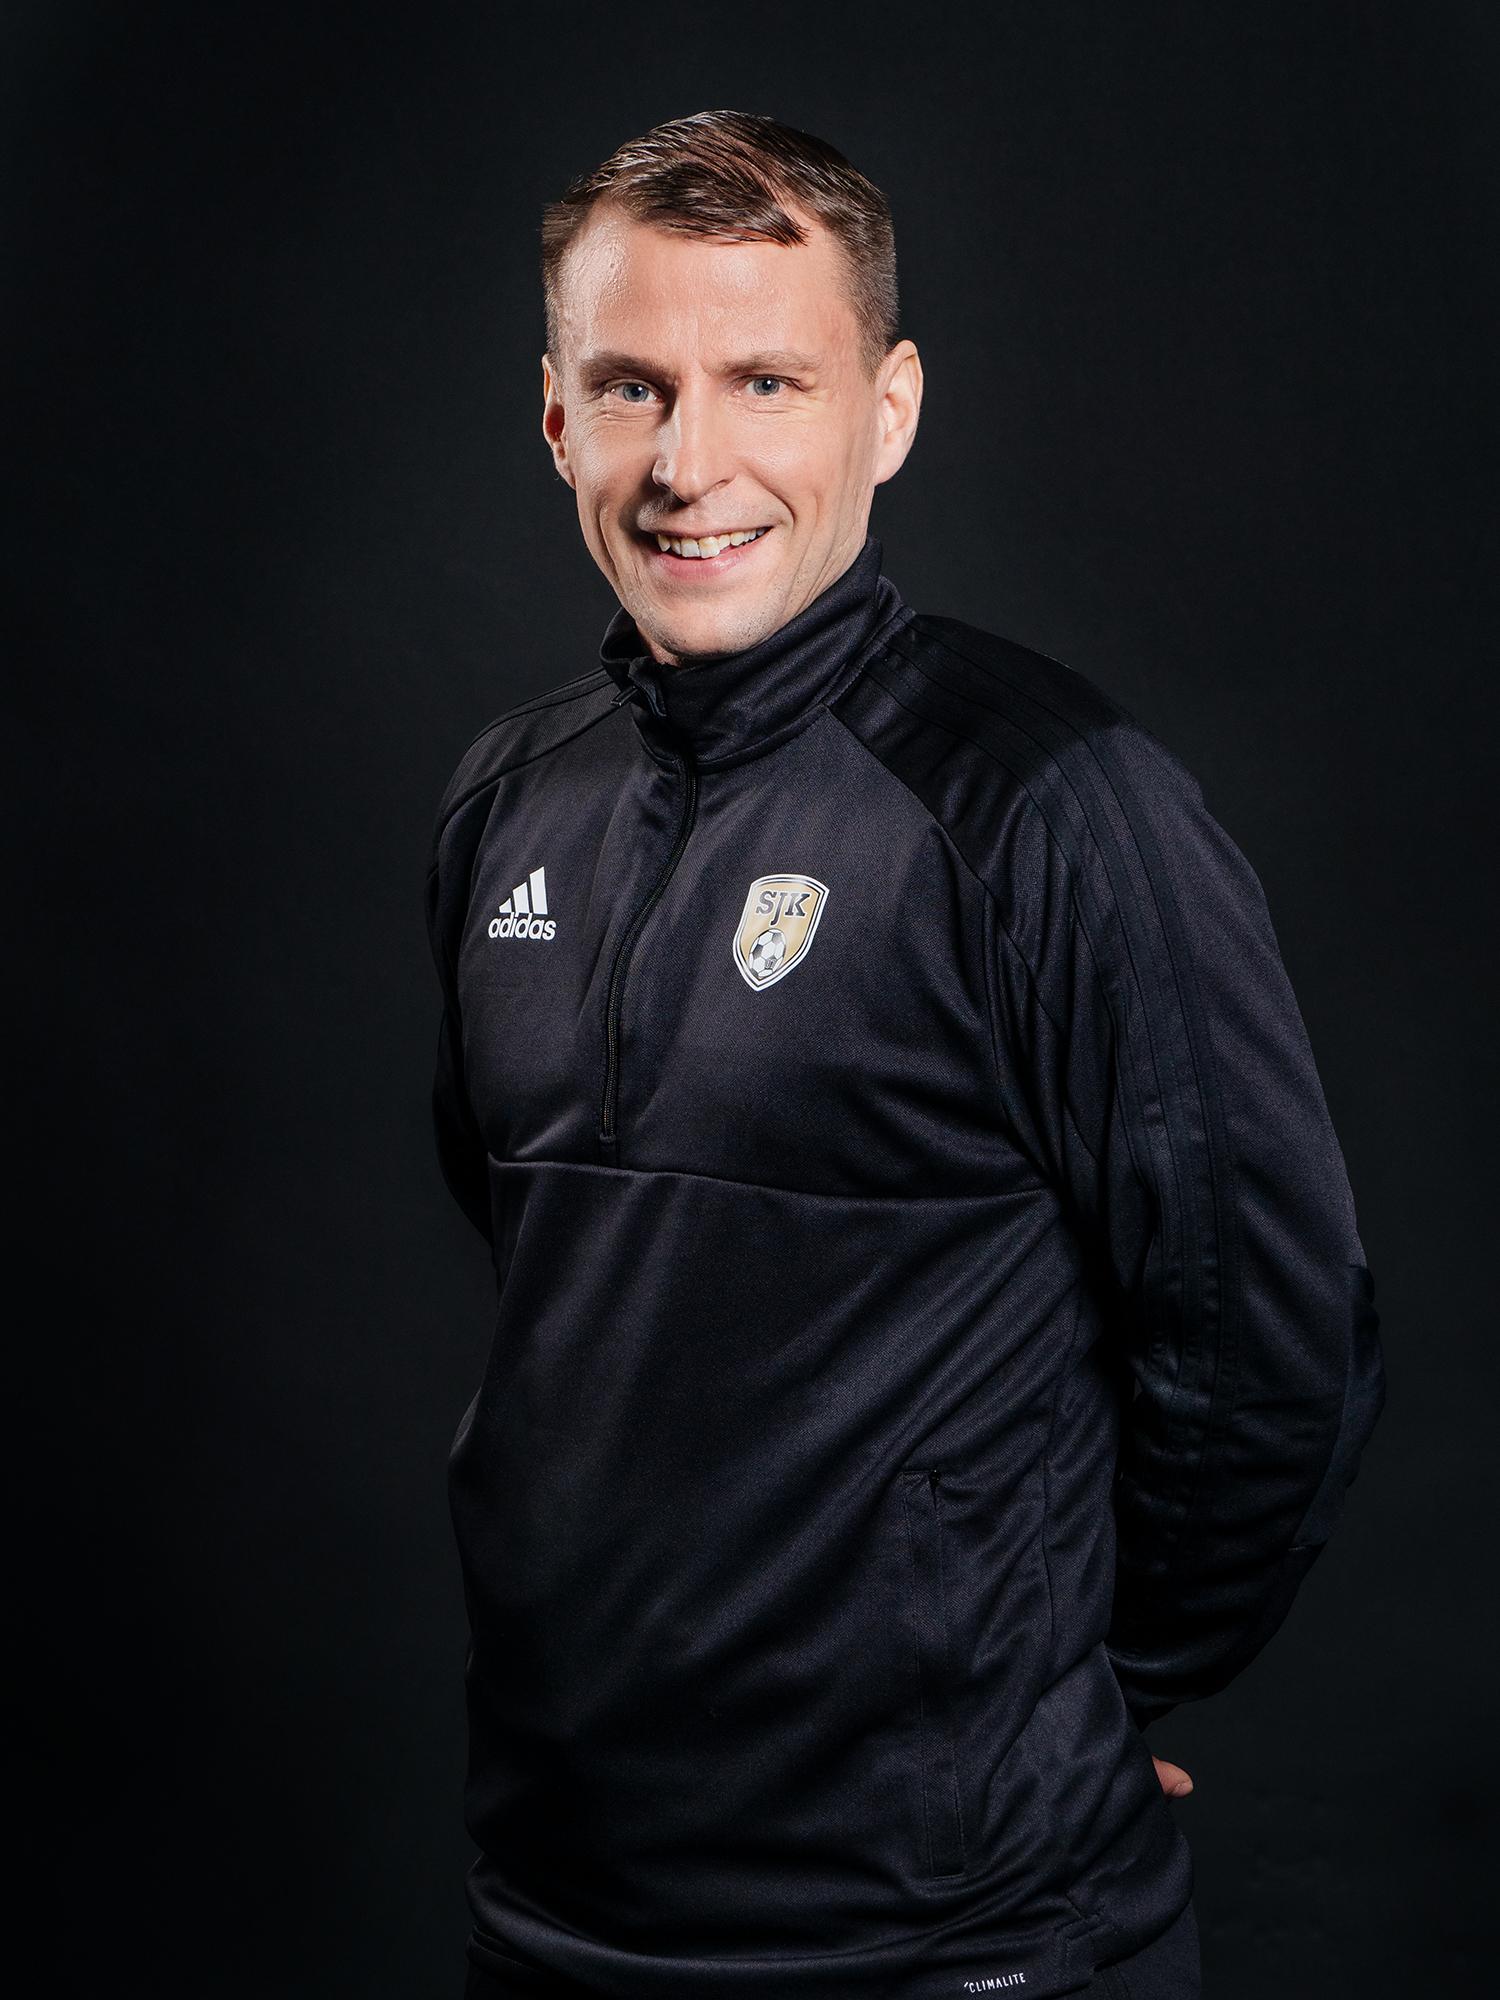 Mikko Kujala